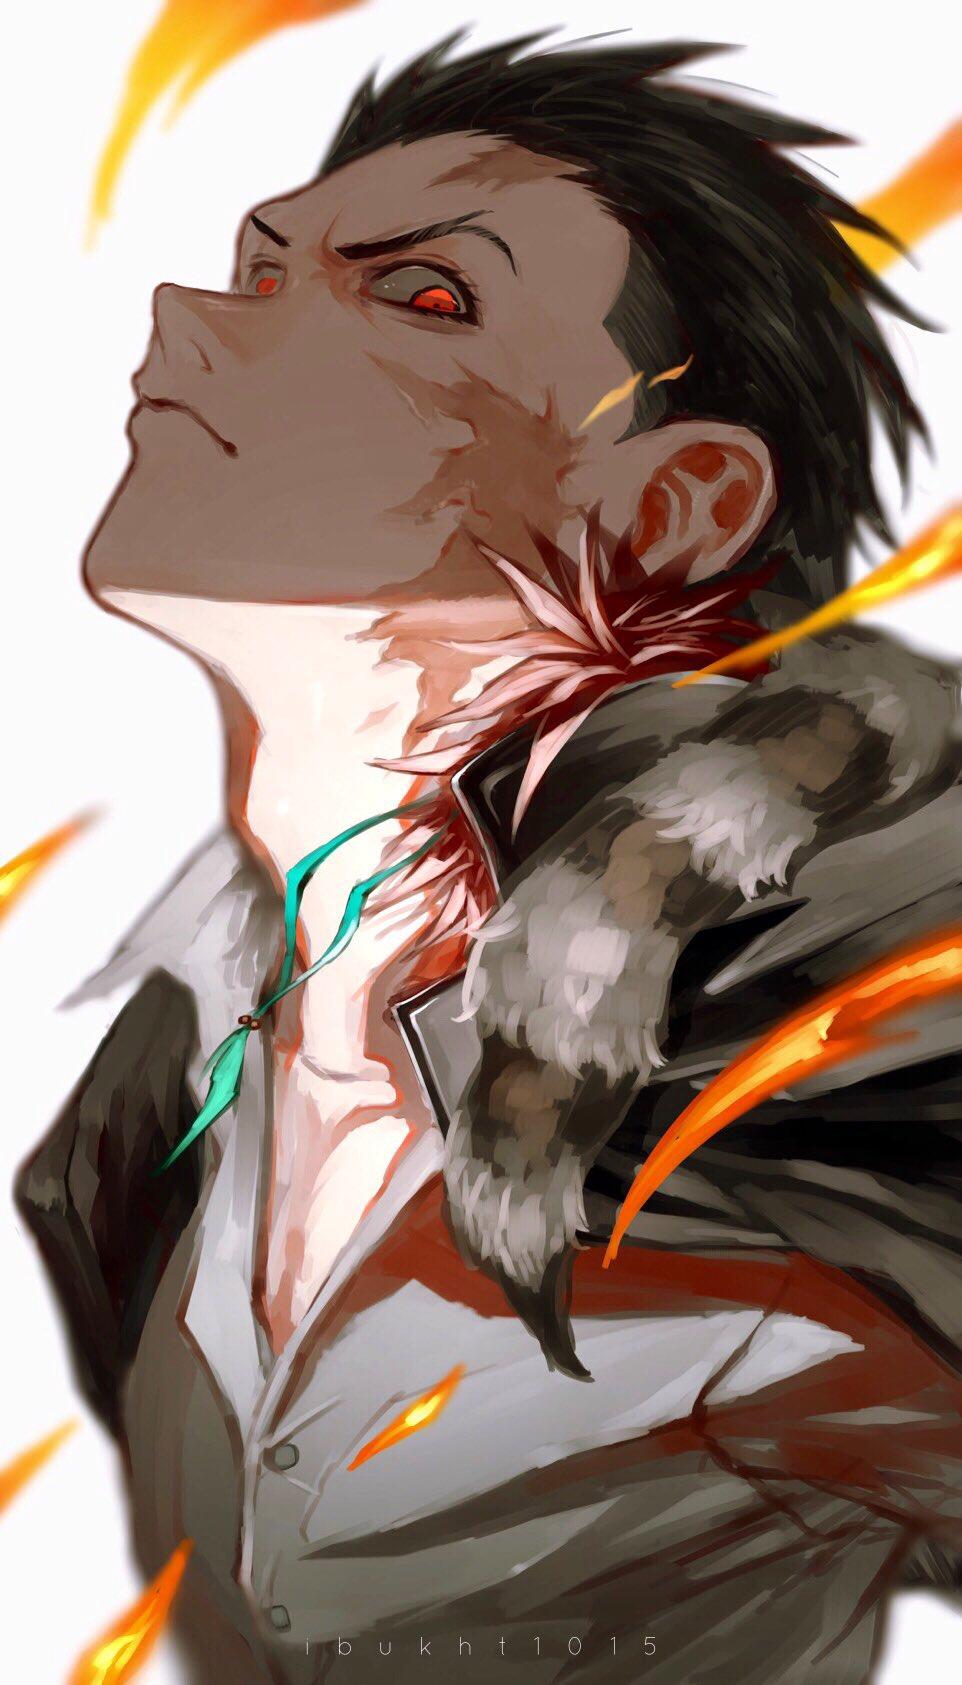 Xanxus Katekyo Hitman Reborn Image 2547158 Zerochan Anime